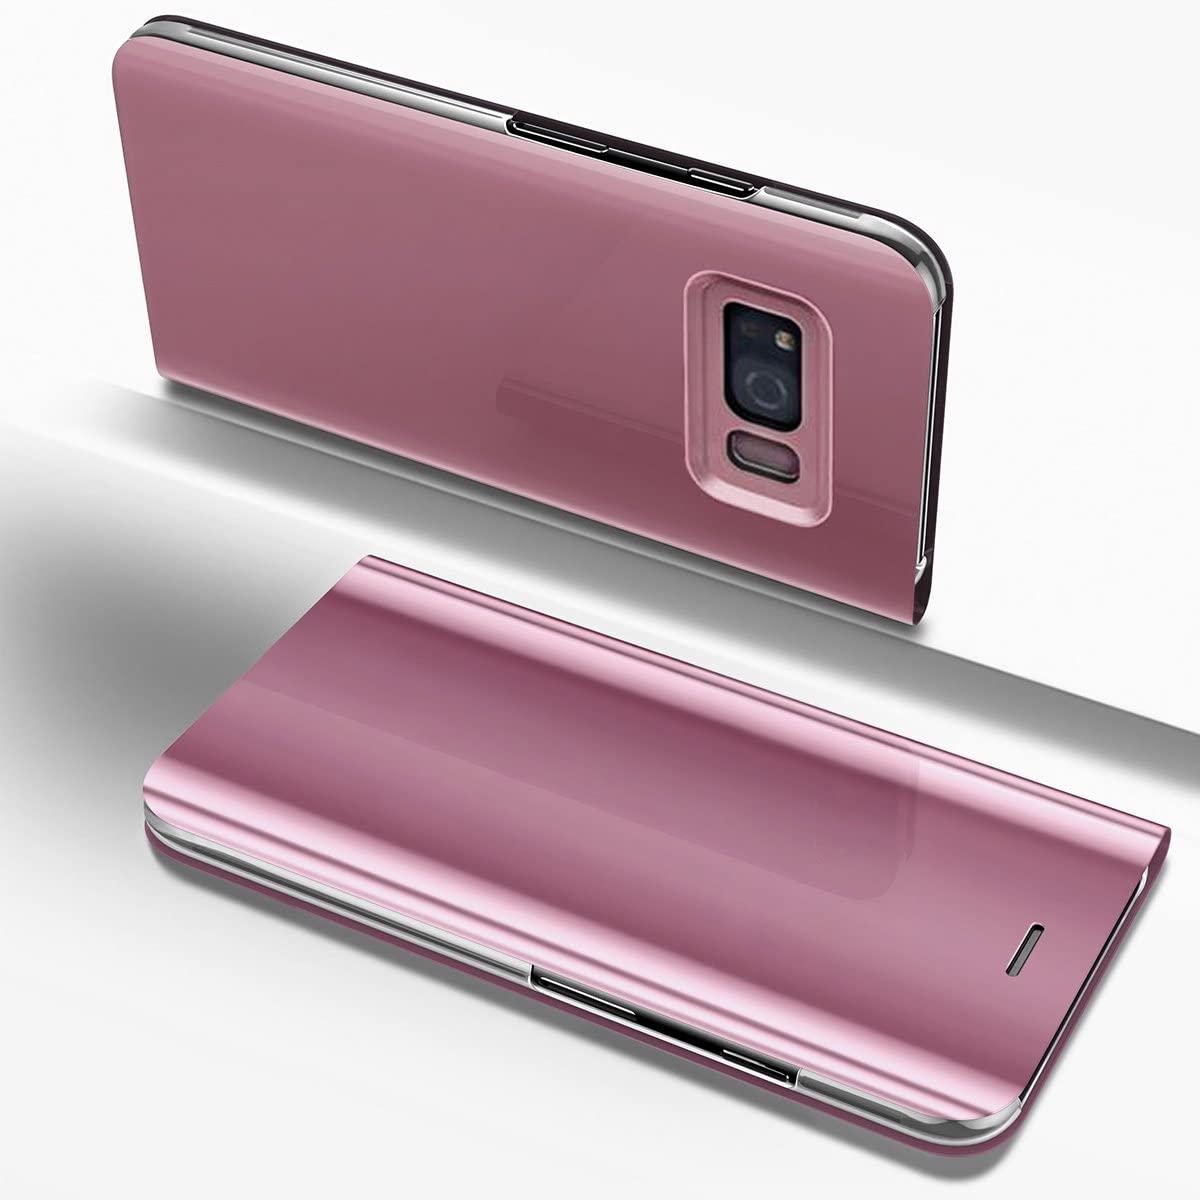 Galaxy S8 Plus Case,PHEZEN Luxury Mirror Makeup Case Plating PU Leather Flip Folio Wallet Case [Kickstand] Magnetic Closure Full Cover Case for Samsung Galaxy S8 Plus (Rose Gold)